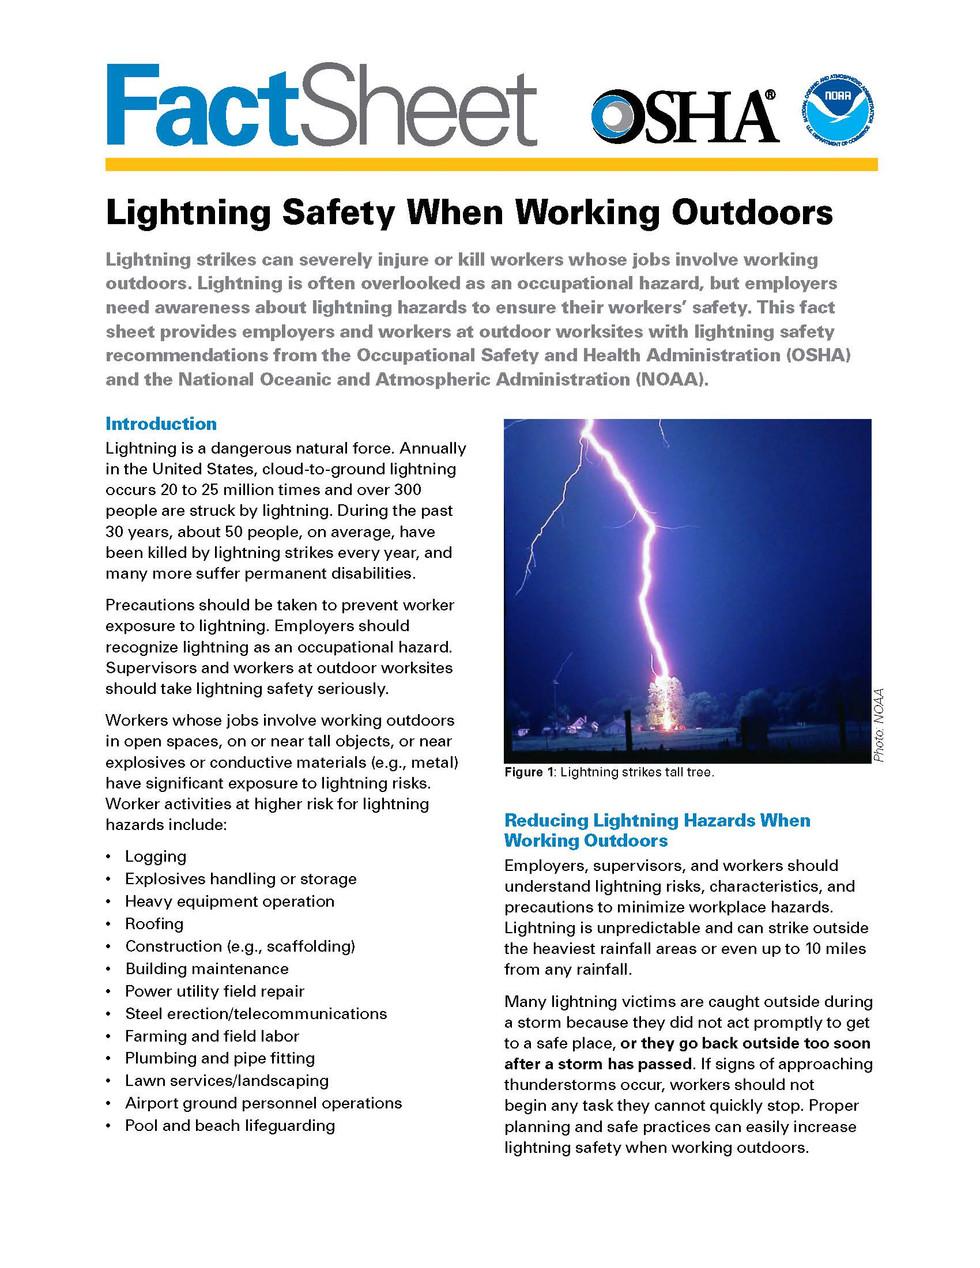 OSHA_FS-3863_Lightning_Safety_05-2016_Pa